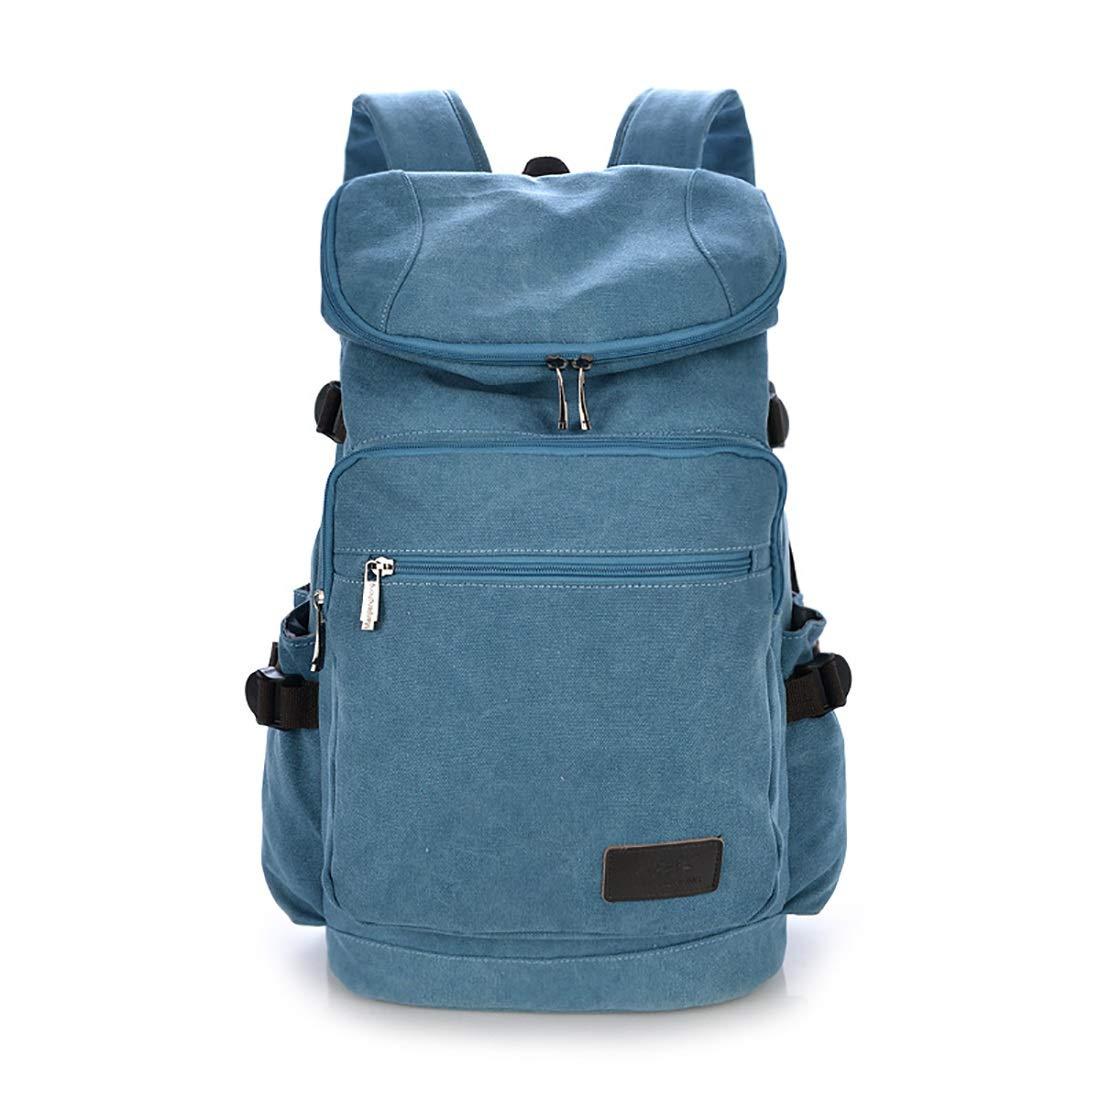 RABILTY レトロ 男女兼用 アウトドア キャンバスバッグ 旅行 大容量 バックパック L ブルー RABILTY B07MK1BWKZ ブルー